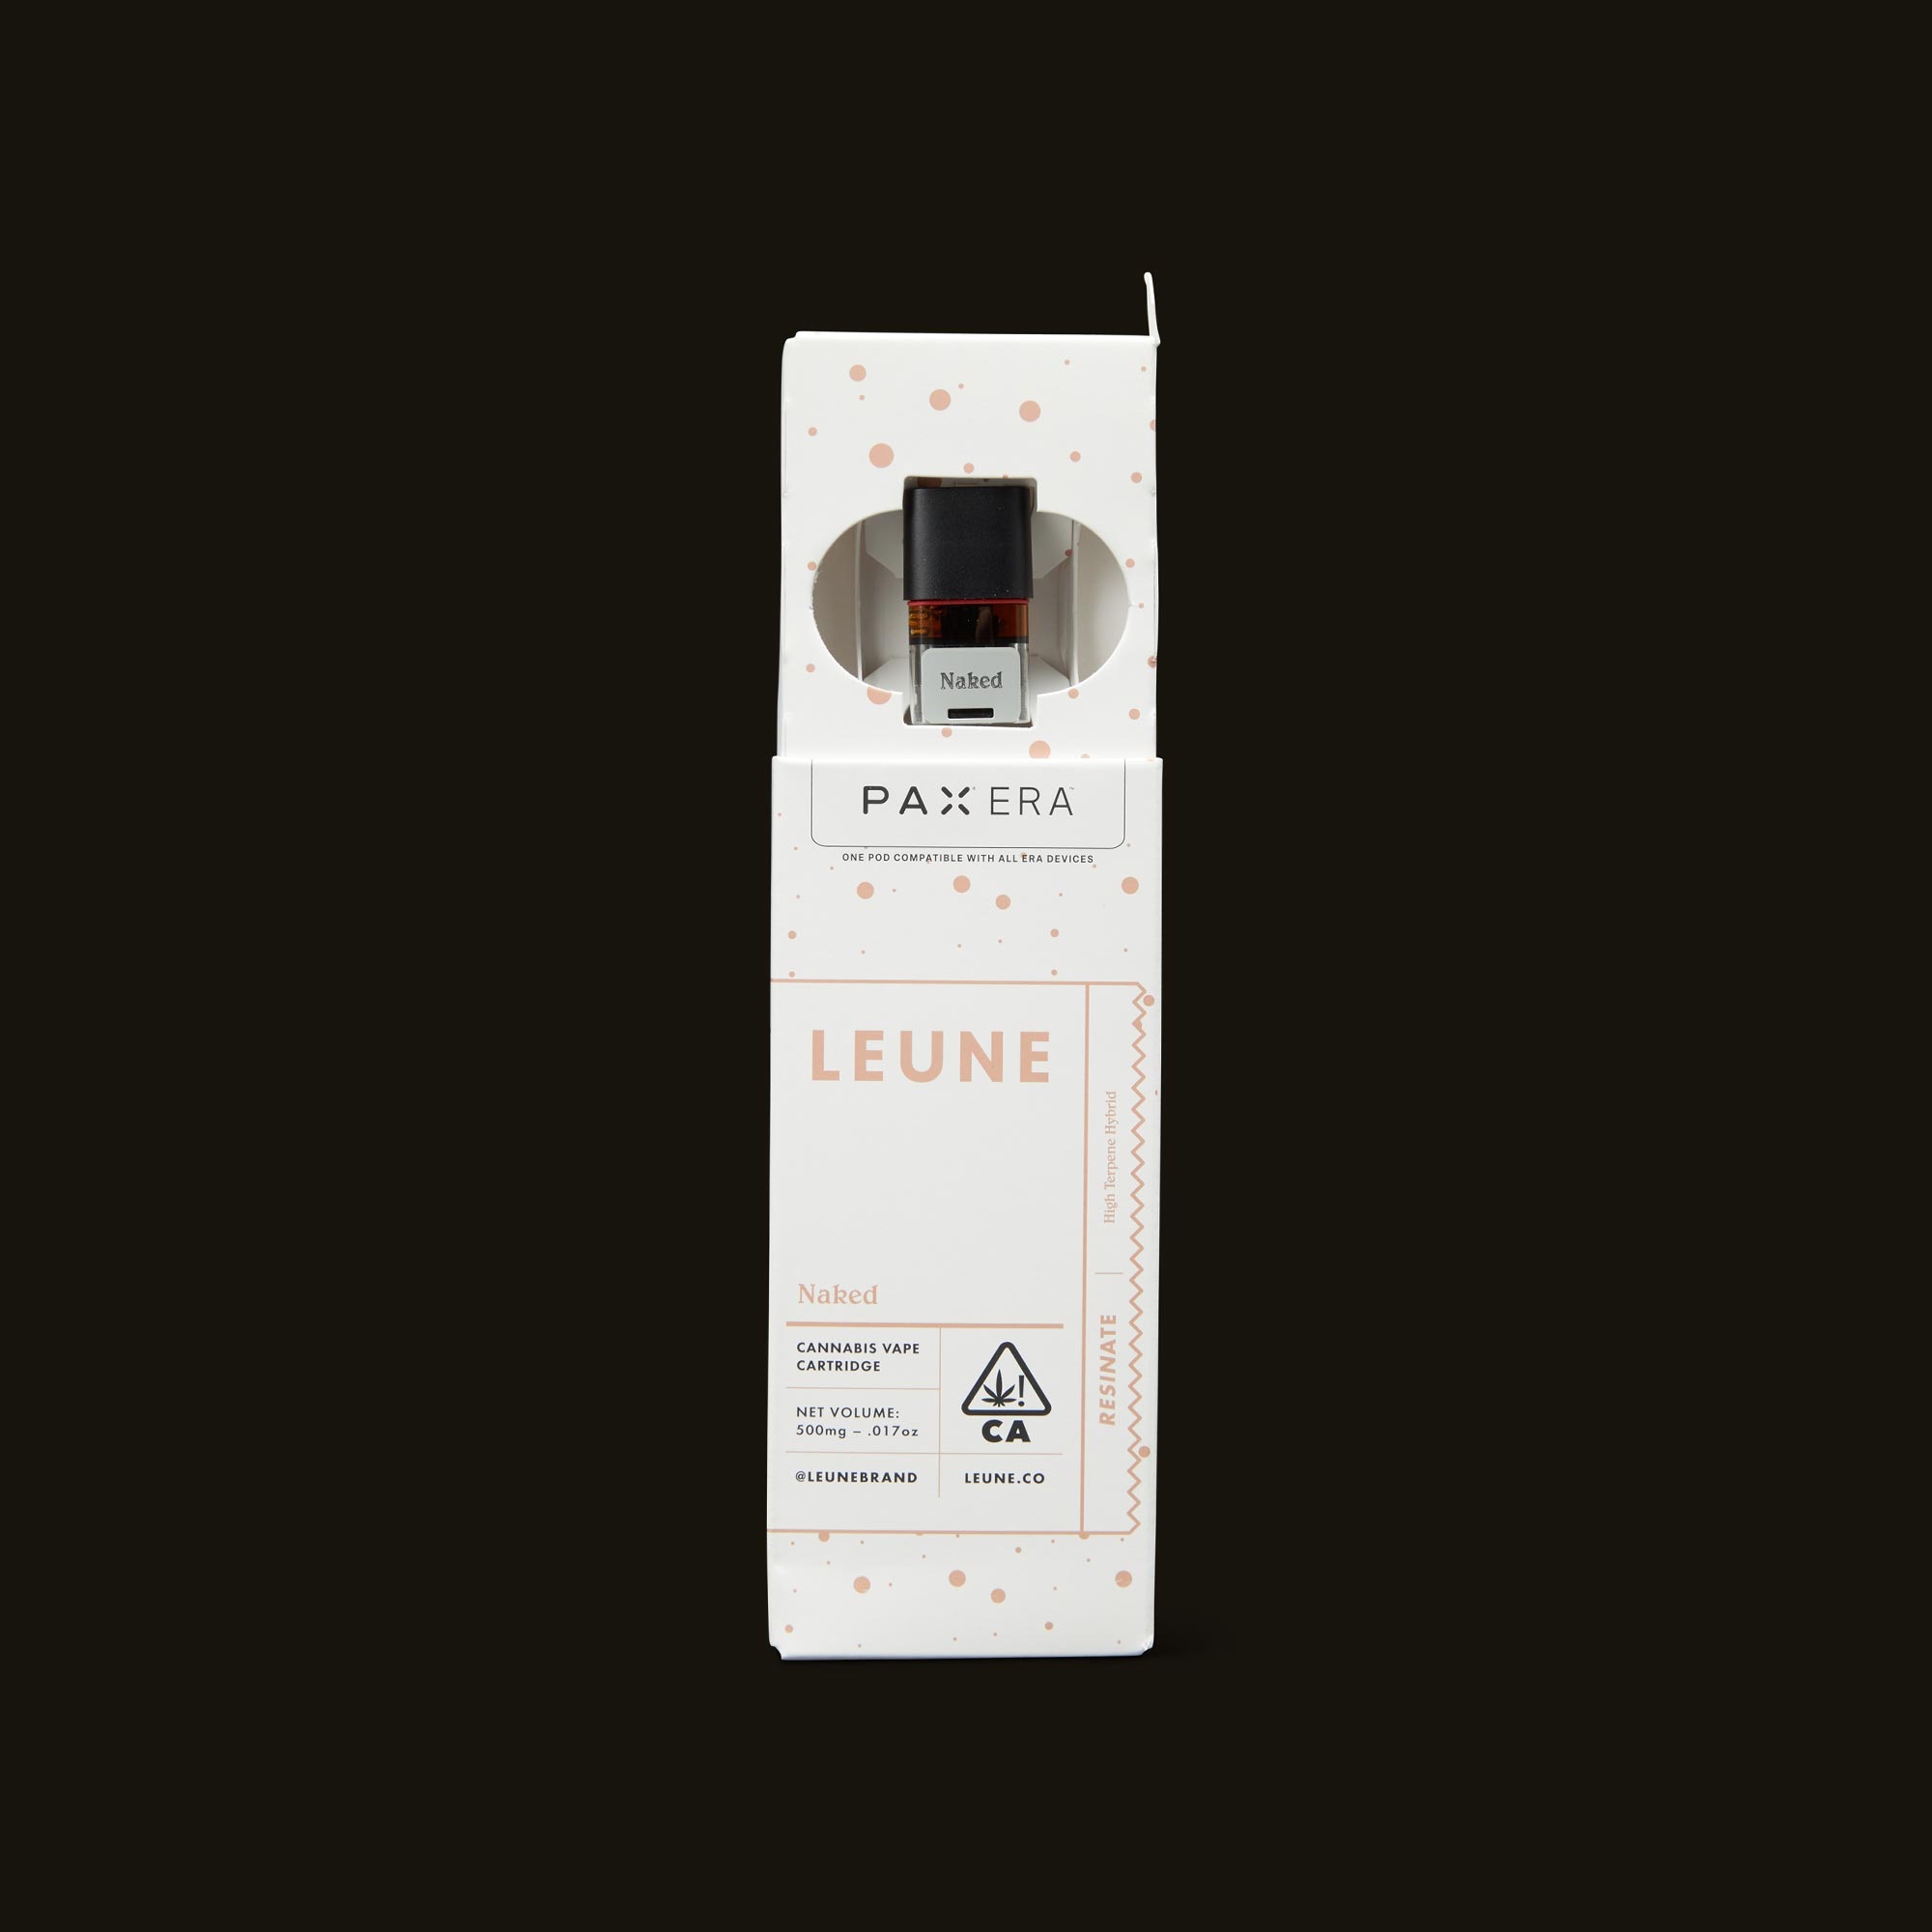 LEUNE Naked Tangie Live Resin PAX Era Pod Open Packaging